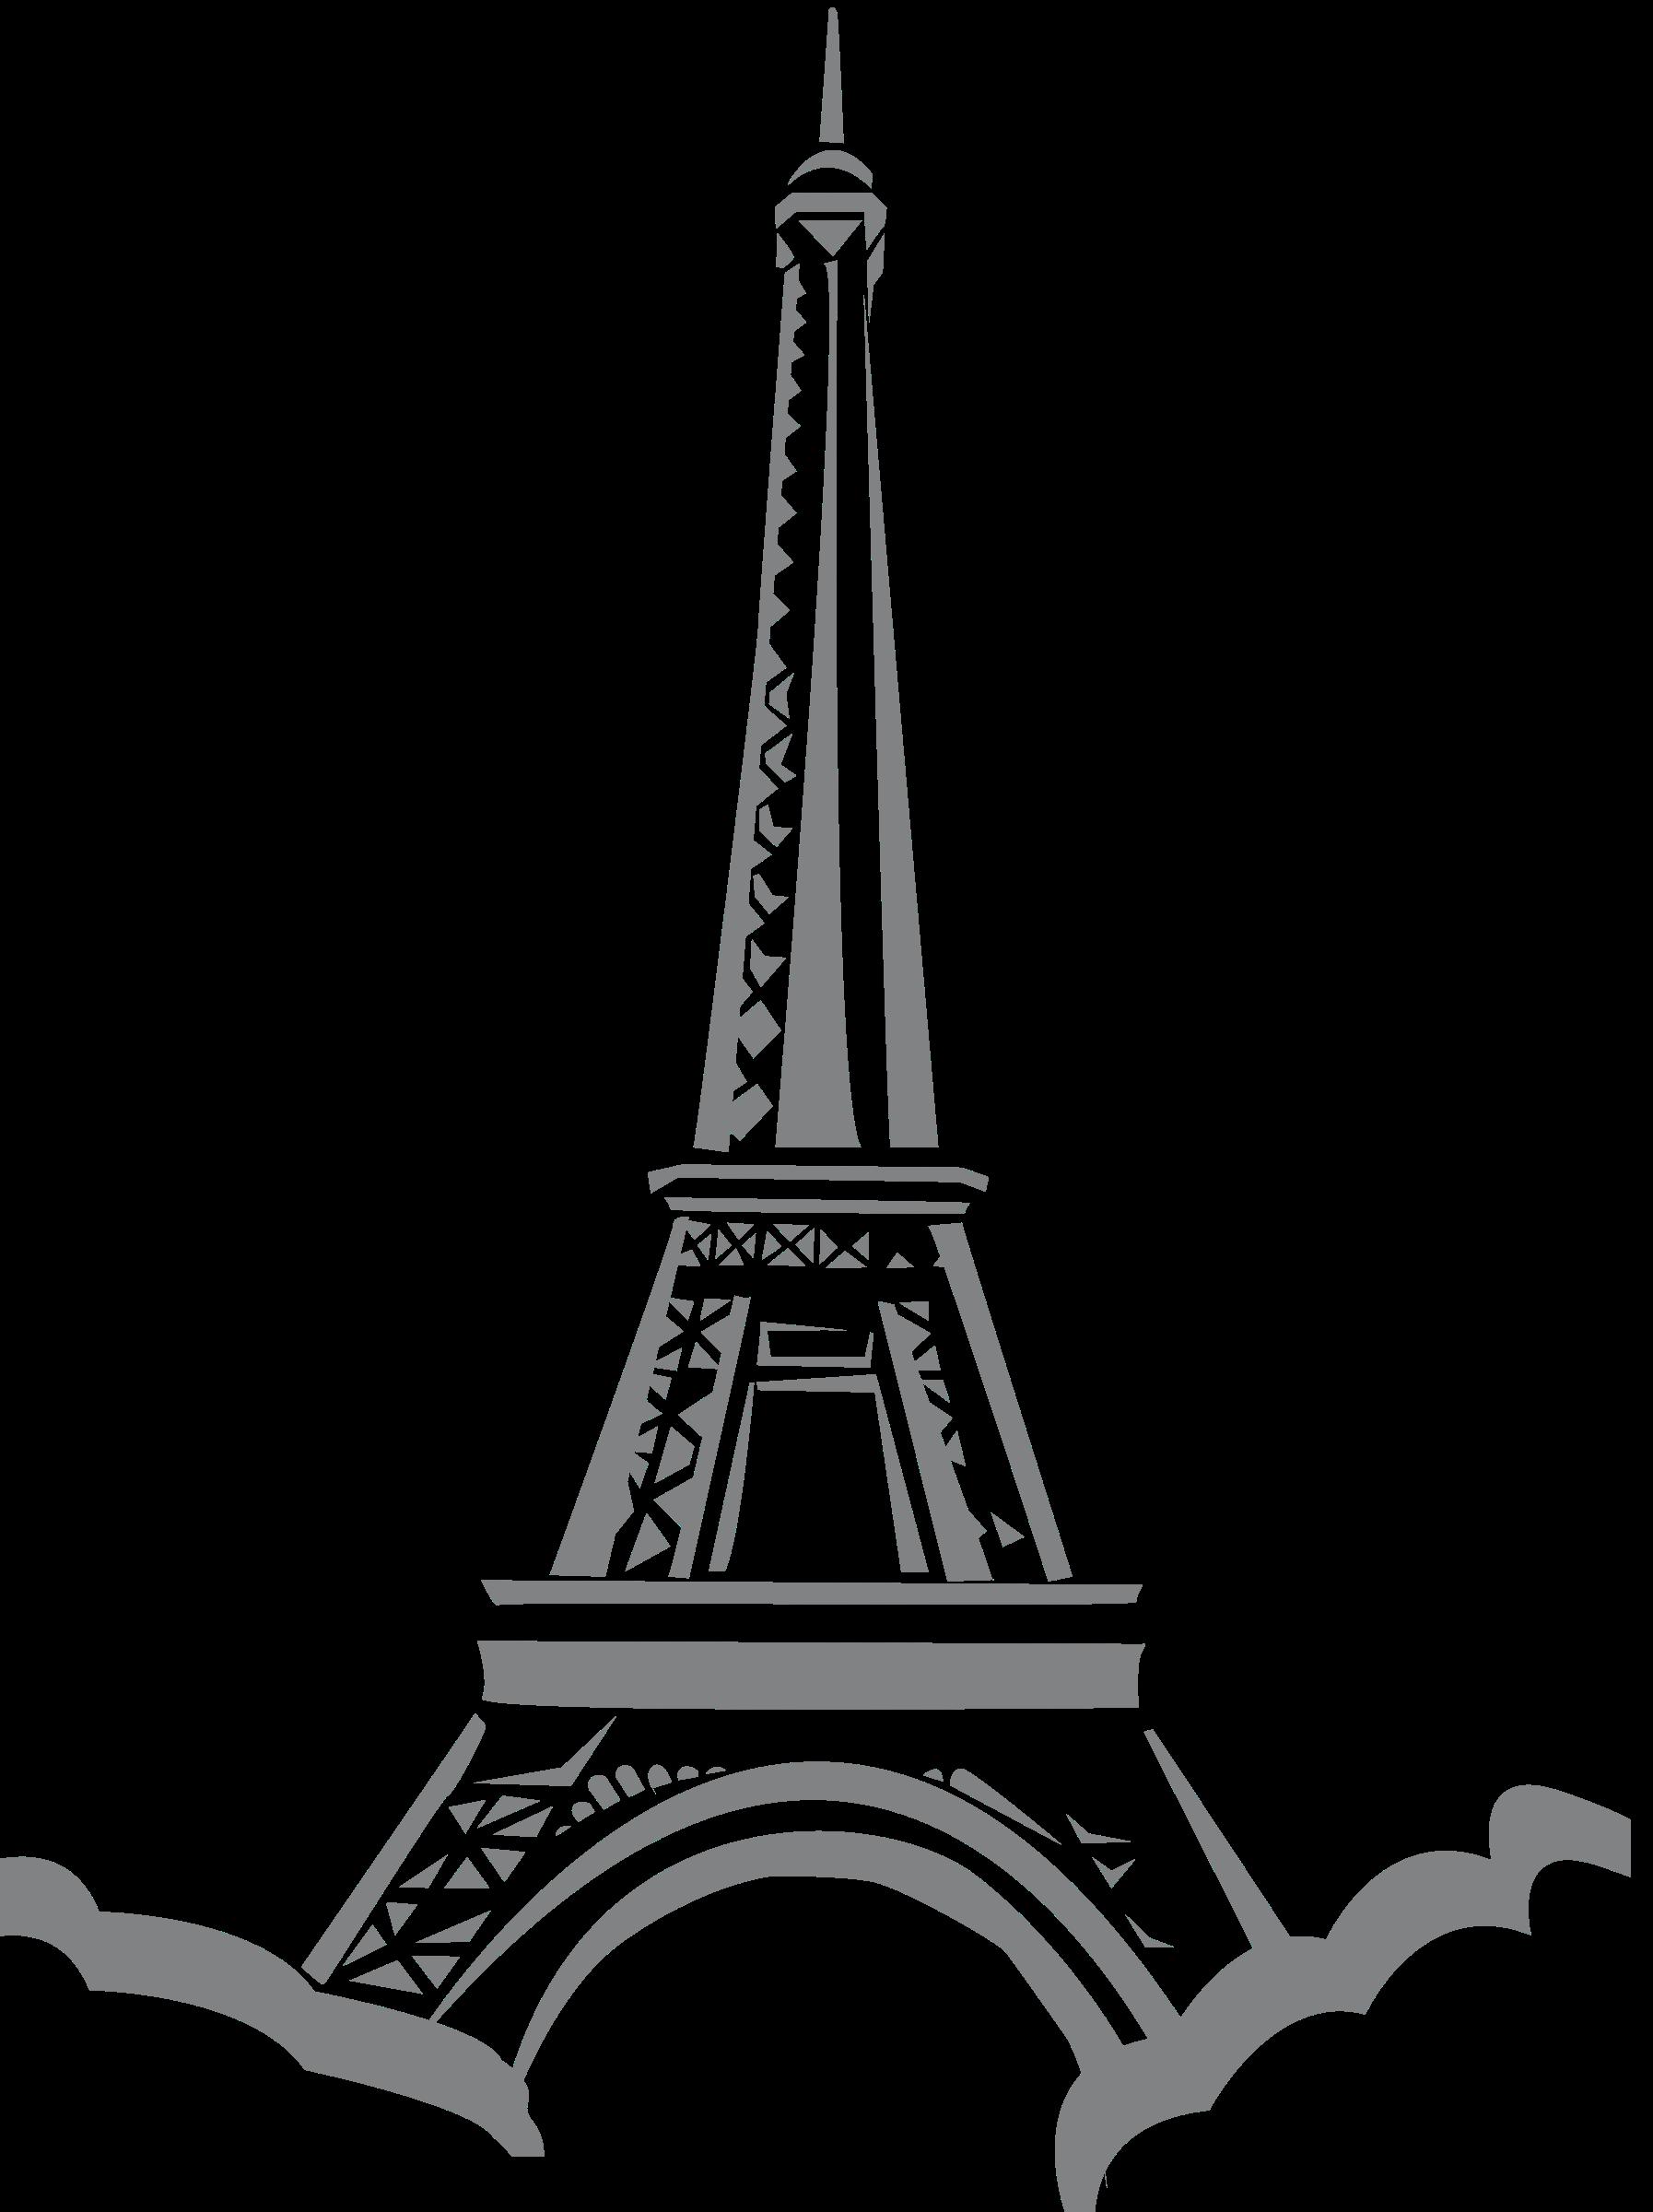 Download Paris Photo HQ PNG Image | FreePNGImg